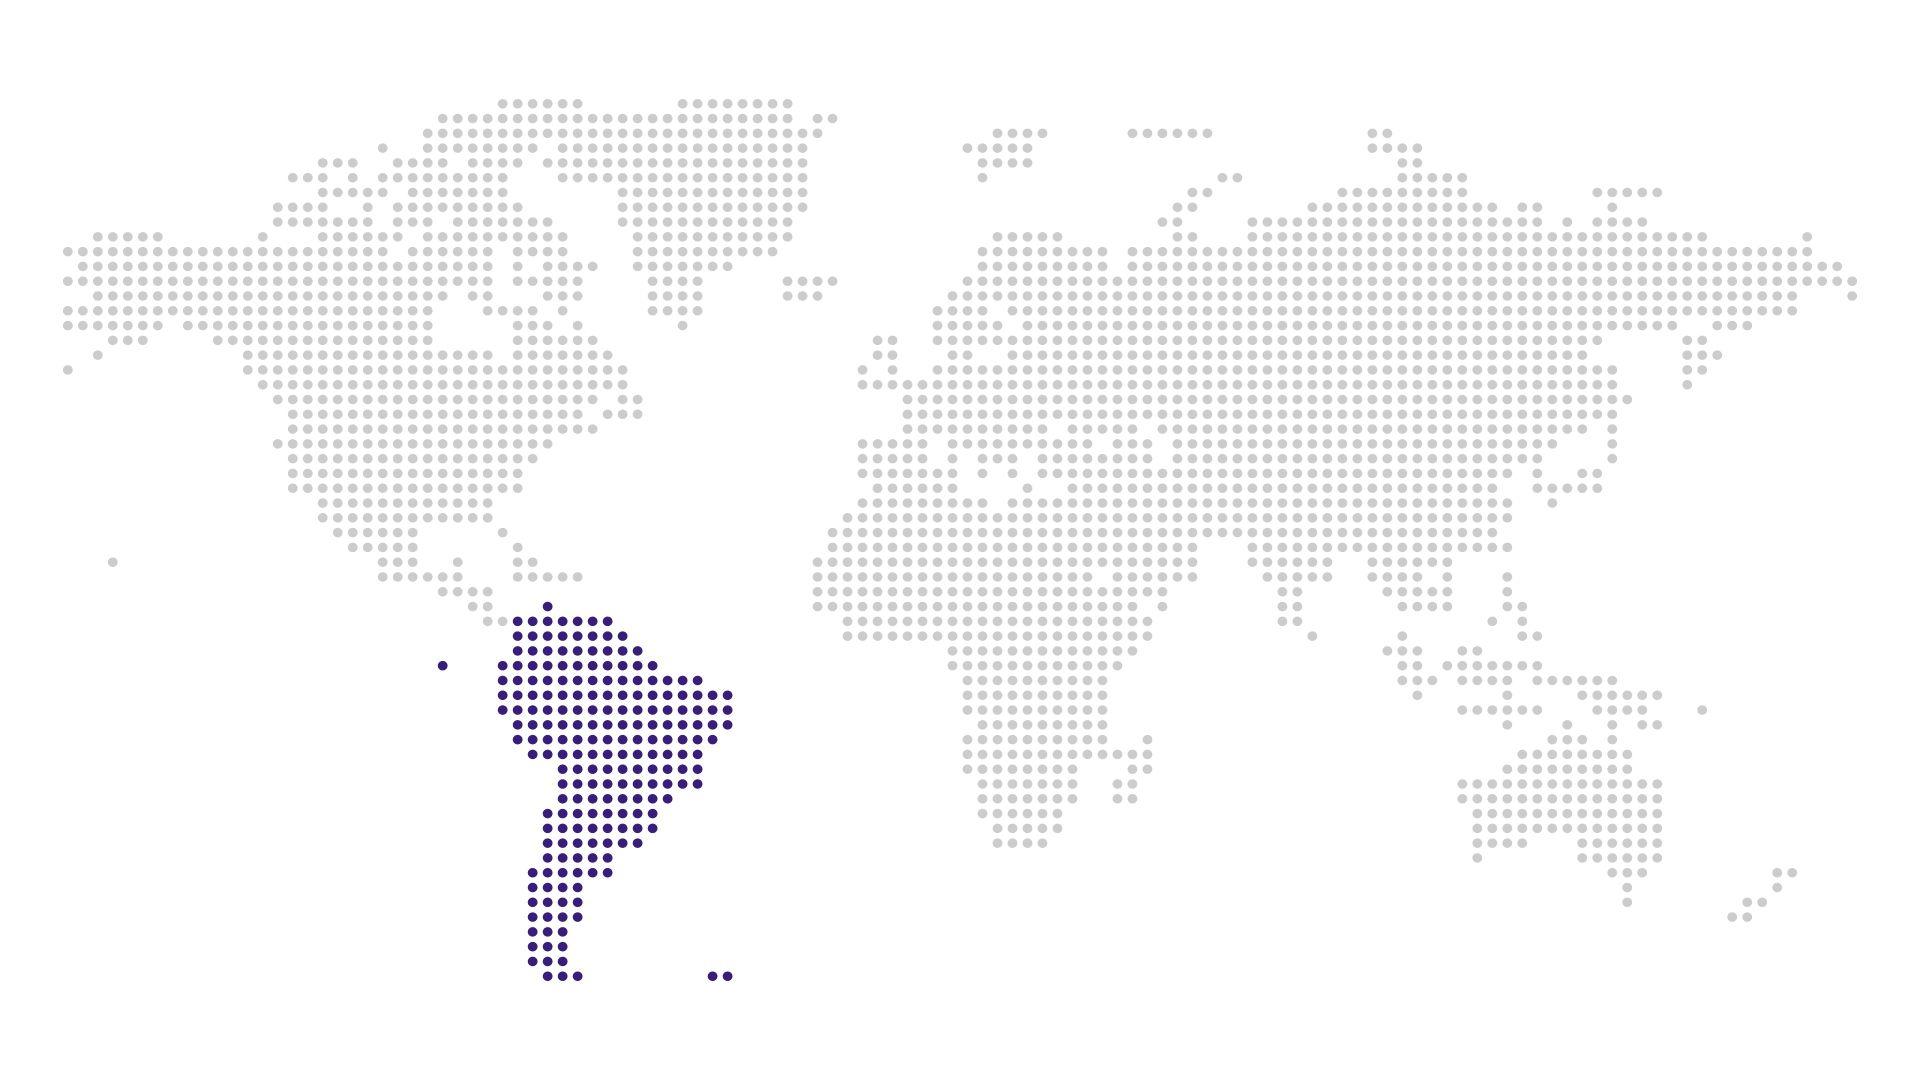 South America Region on map